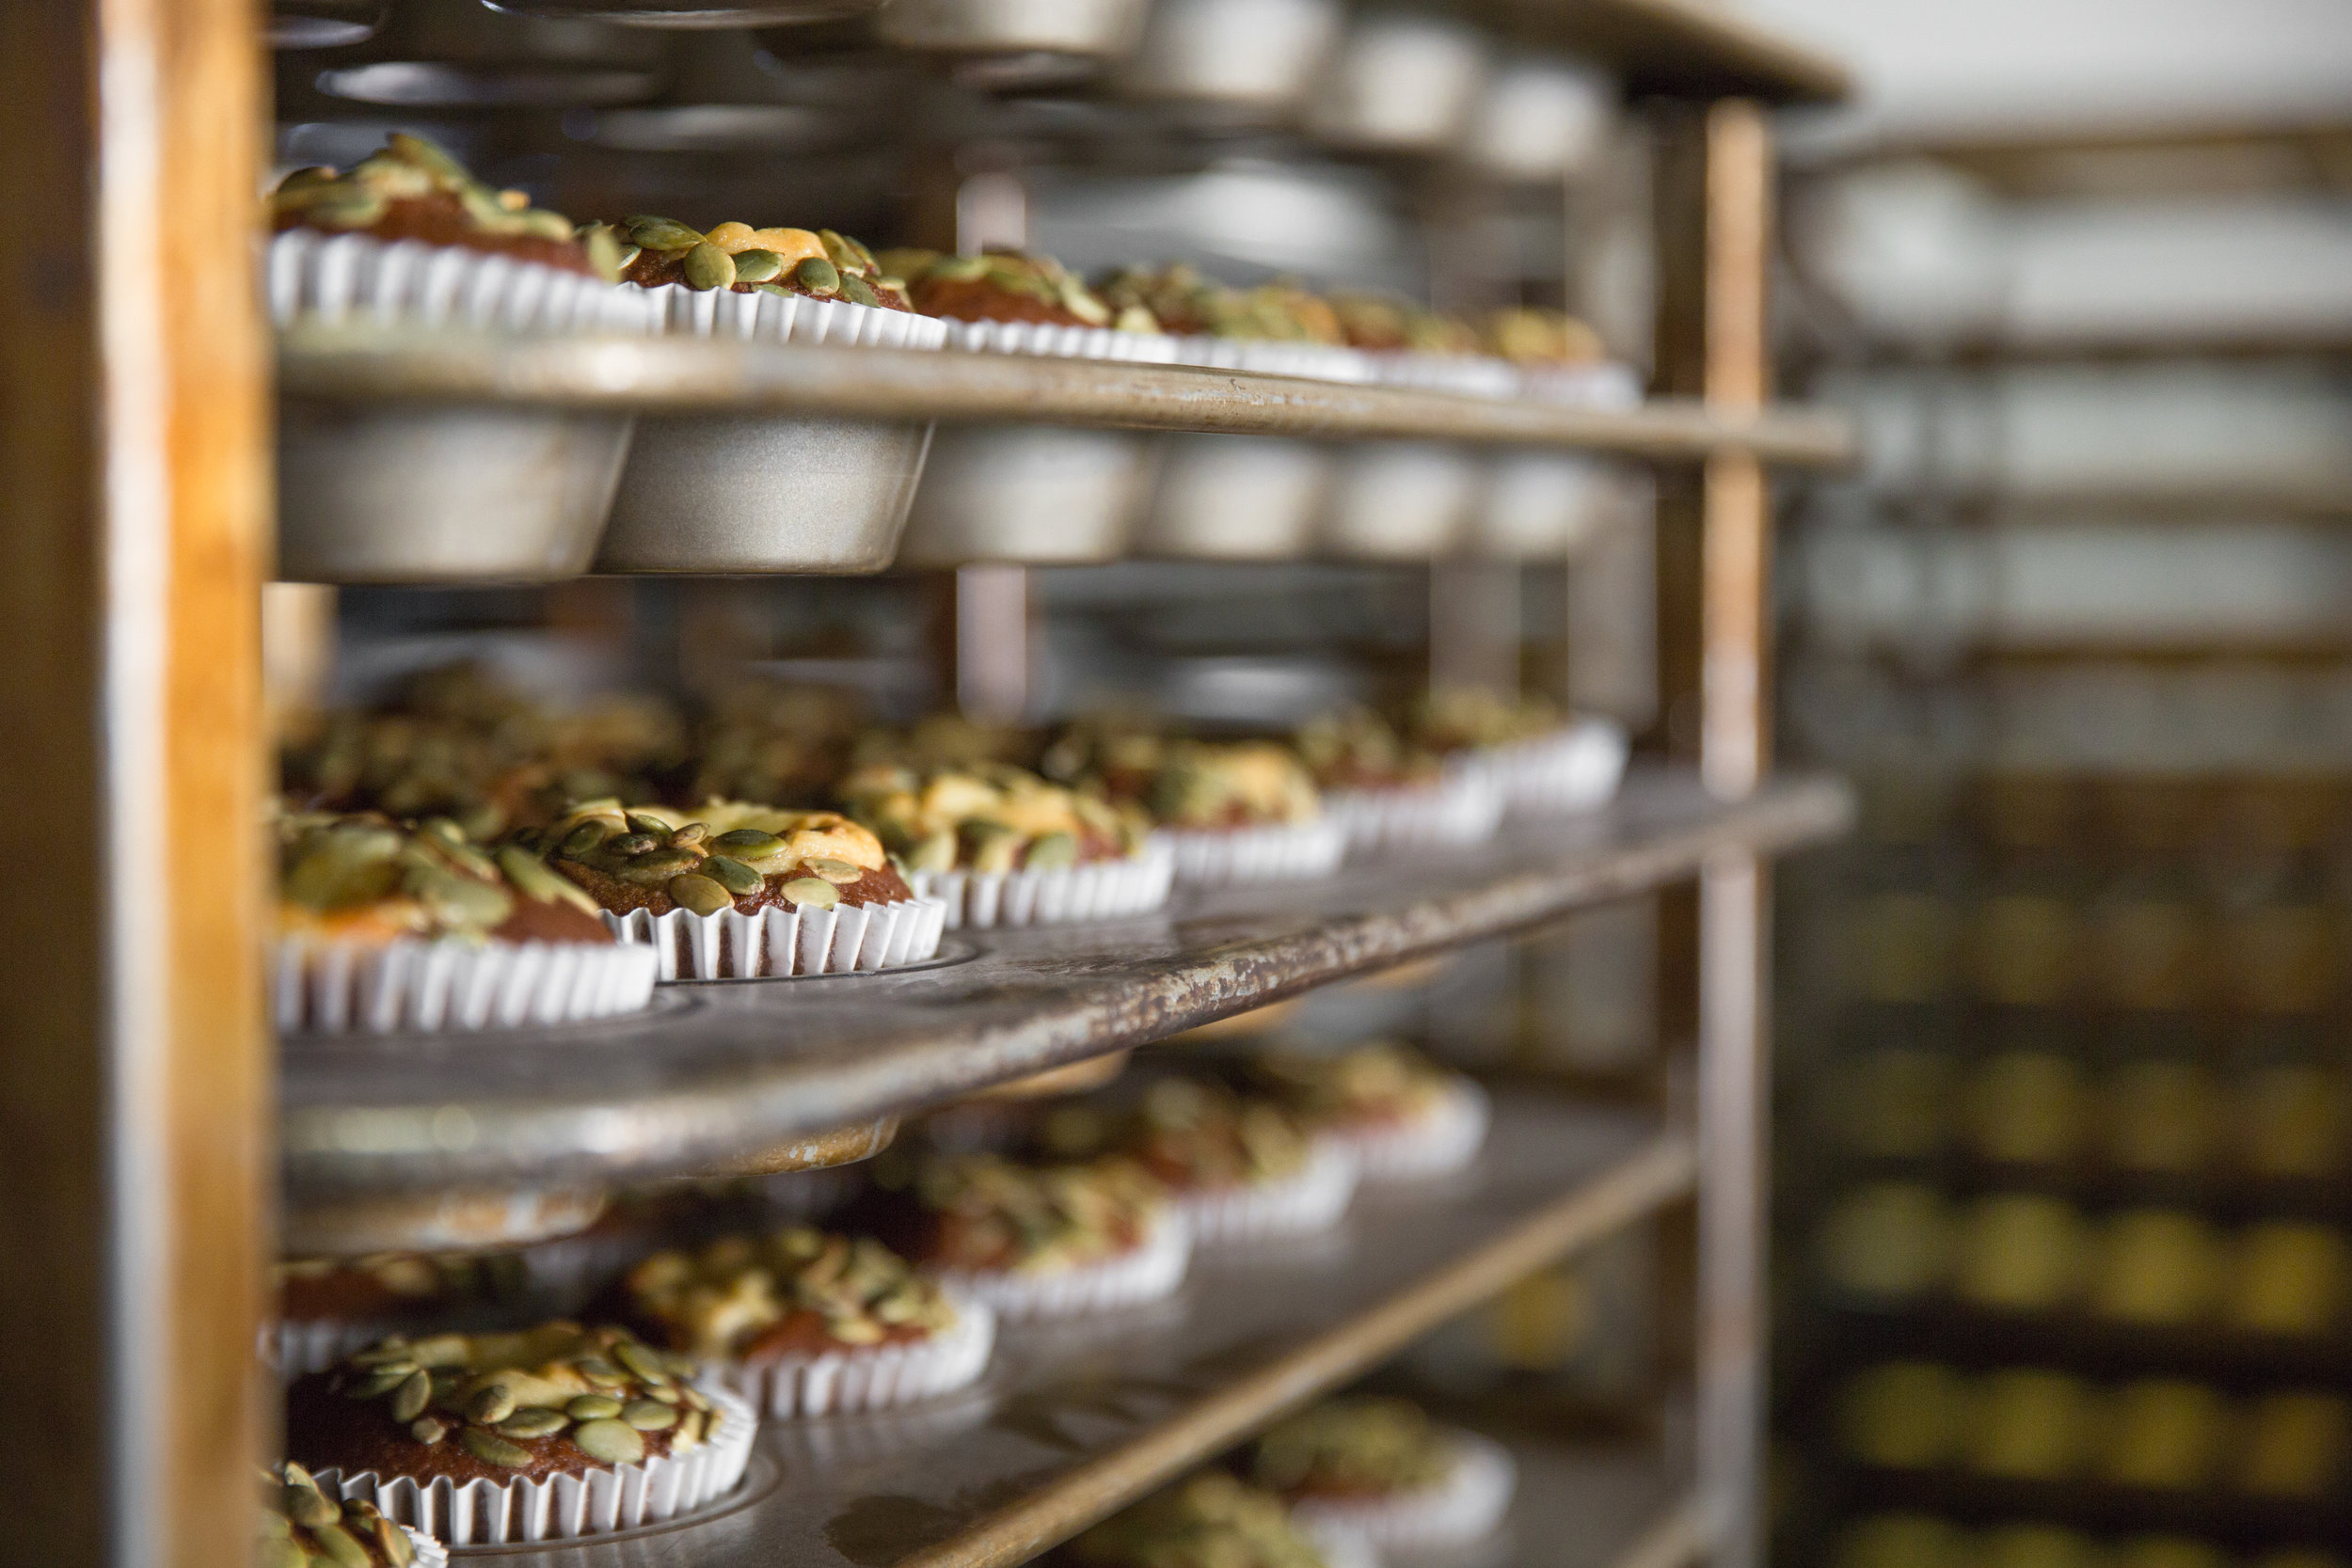 Muffins on rack FINALWalkthrough-14-HIRES-FINAL.jpg